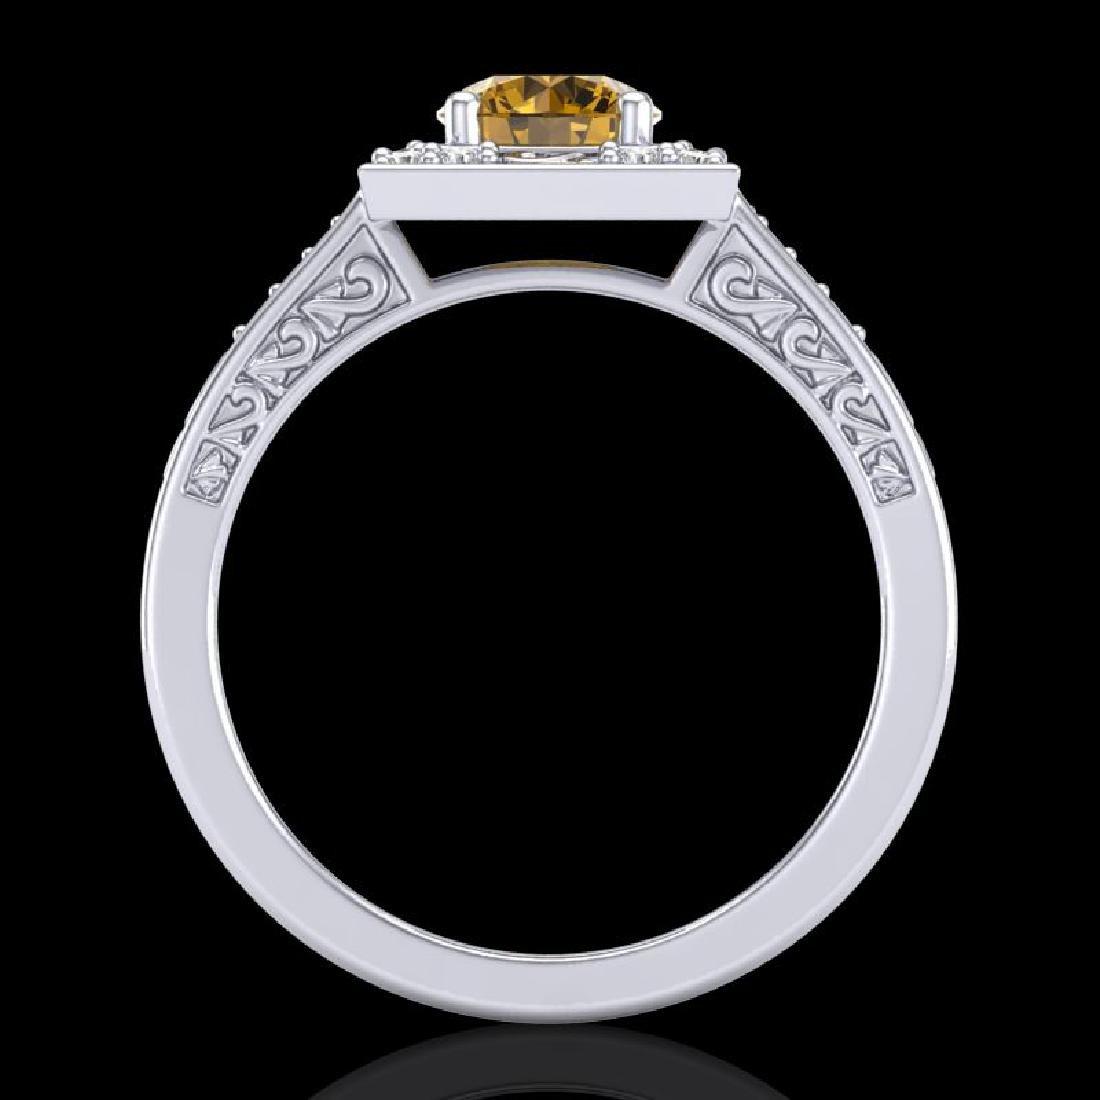 1.1 CTW Intense Fancy Yellow Diamond Engagement Art - 3